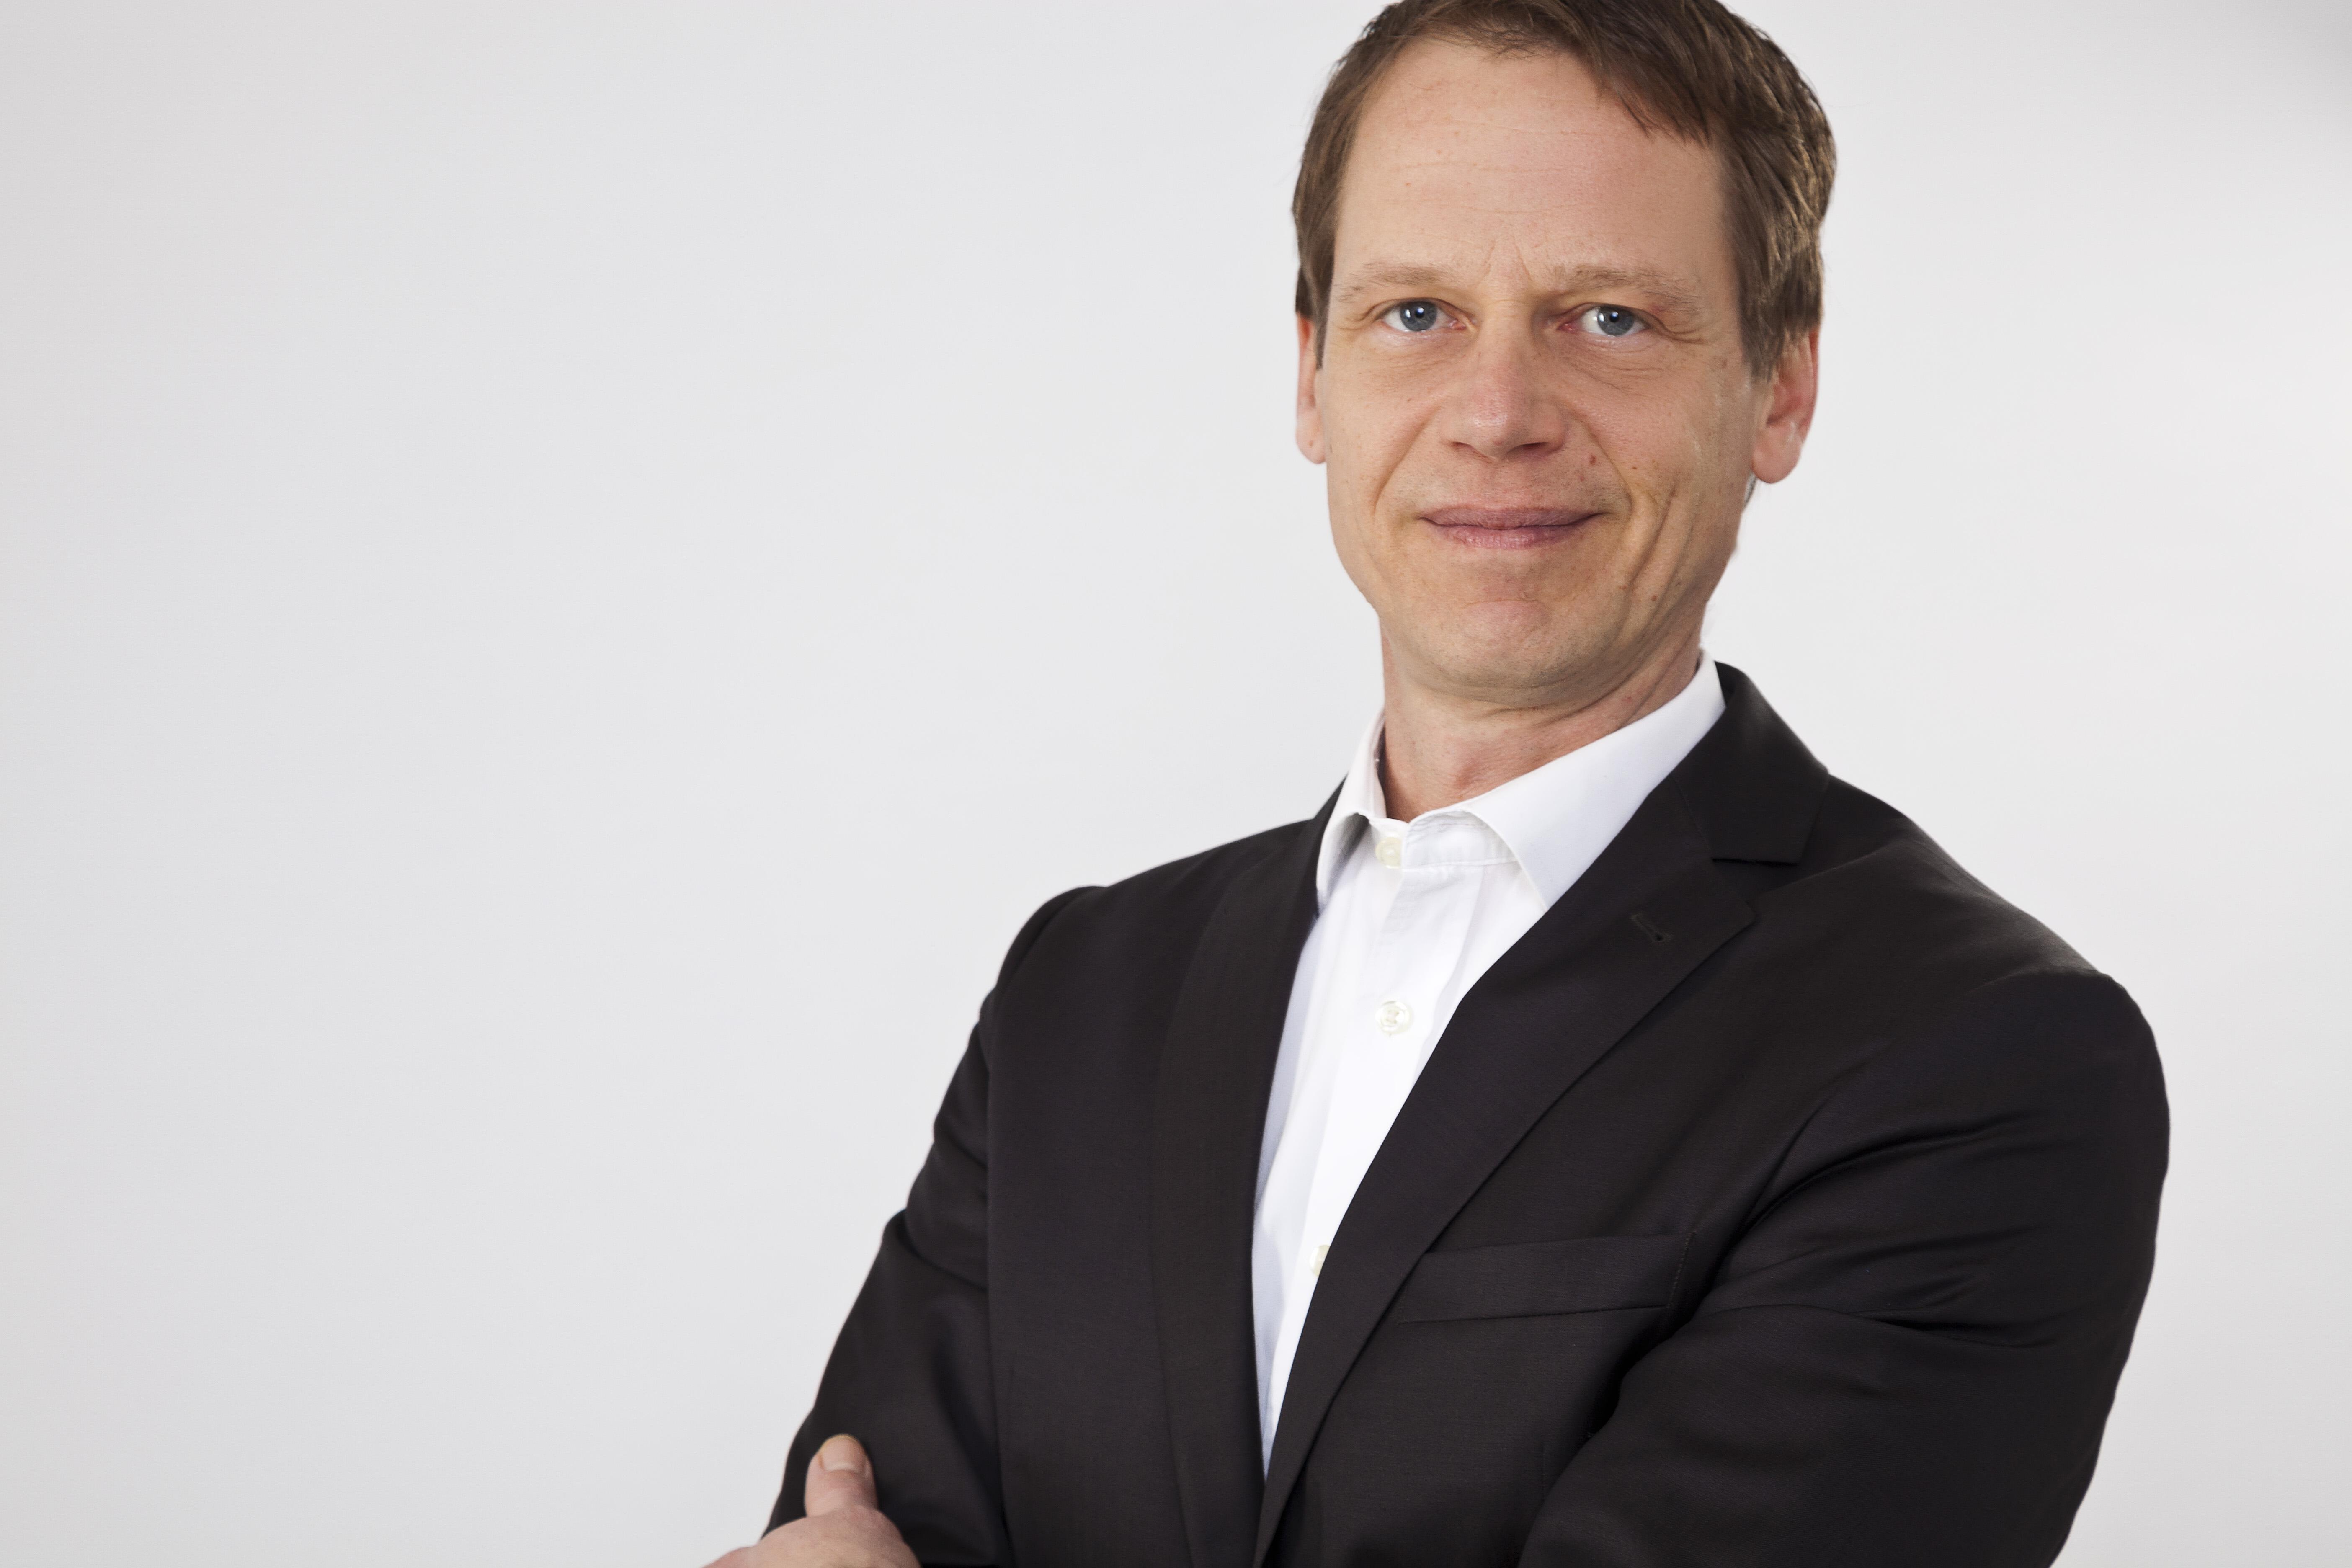 Tim Helm